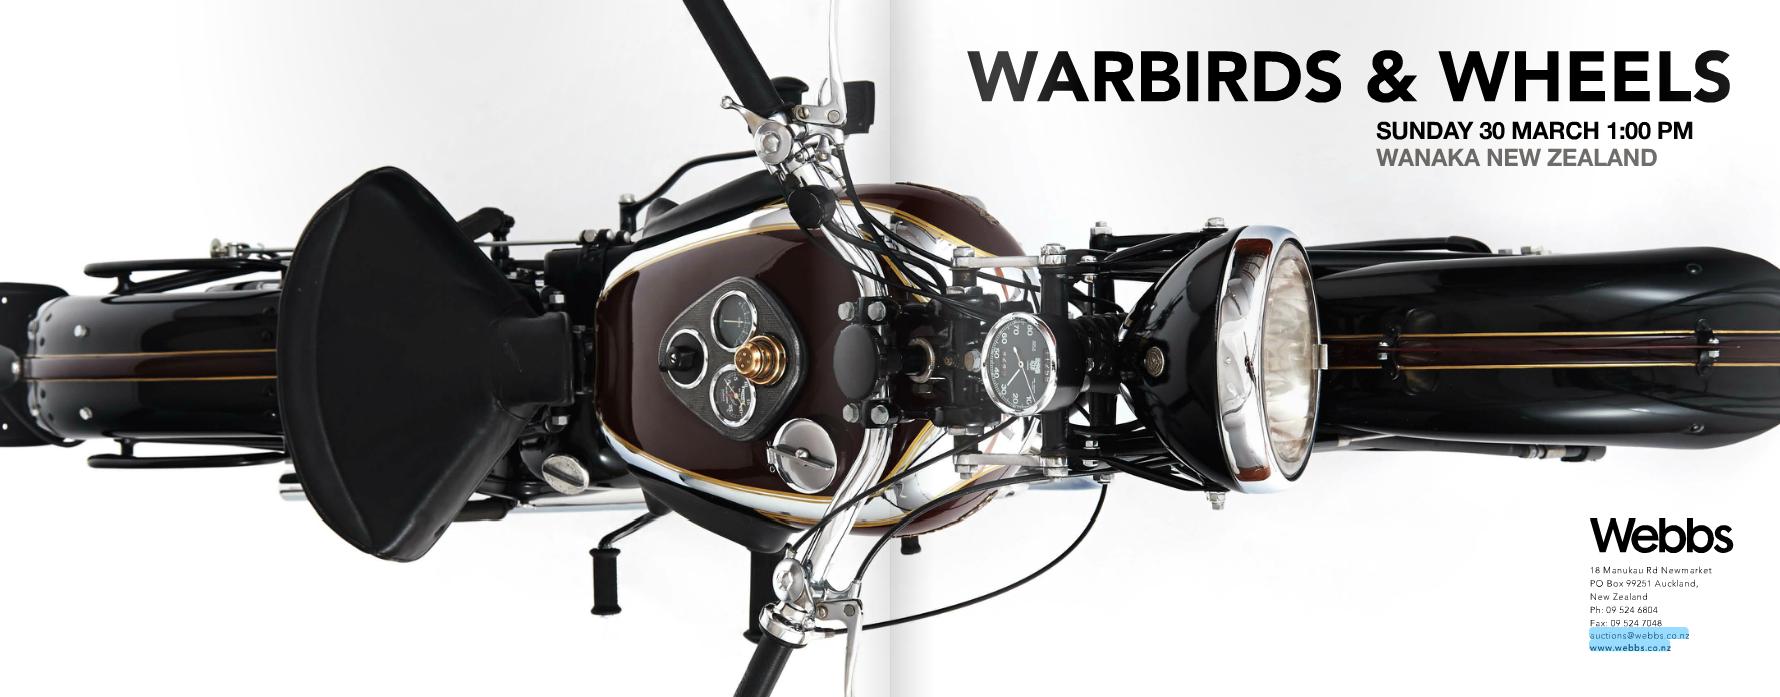 Warbirds & Wheels Webb's Auction in New Zealand